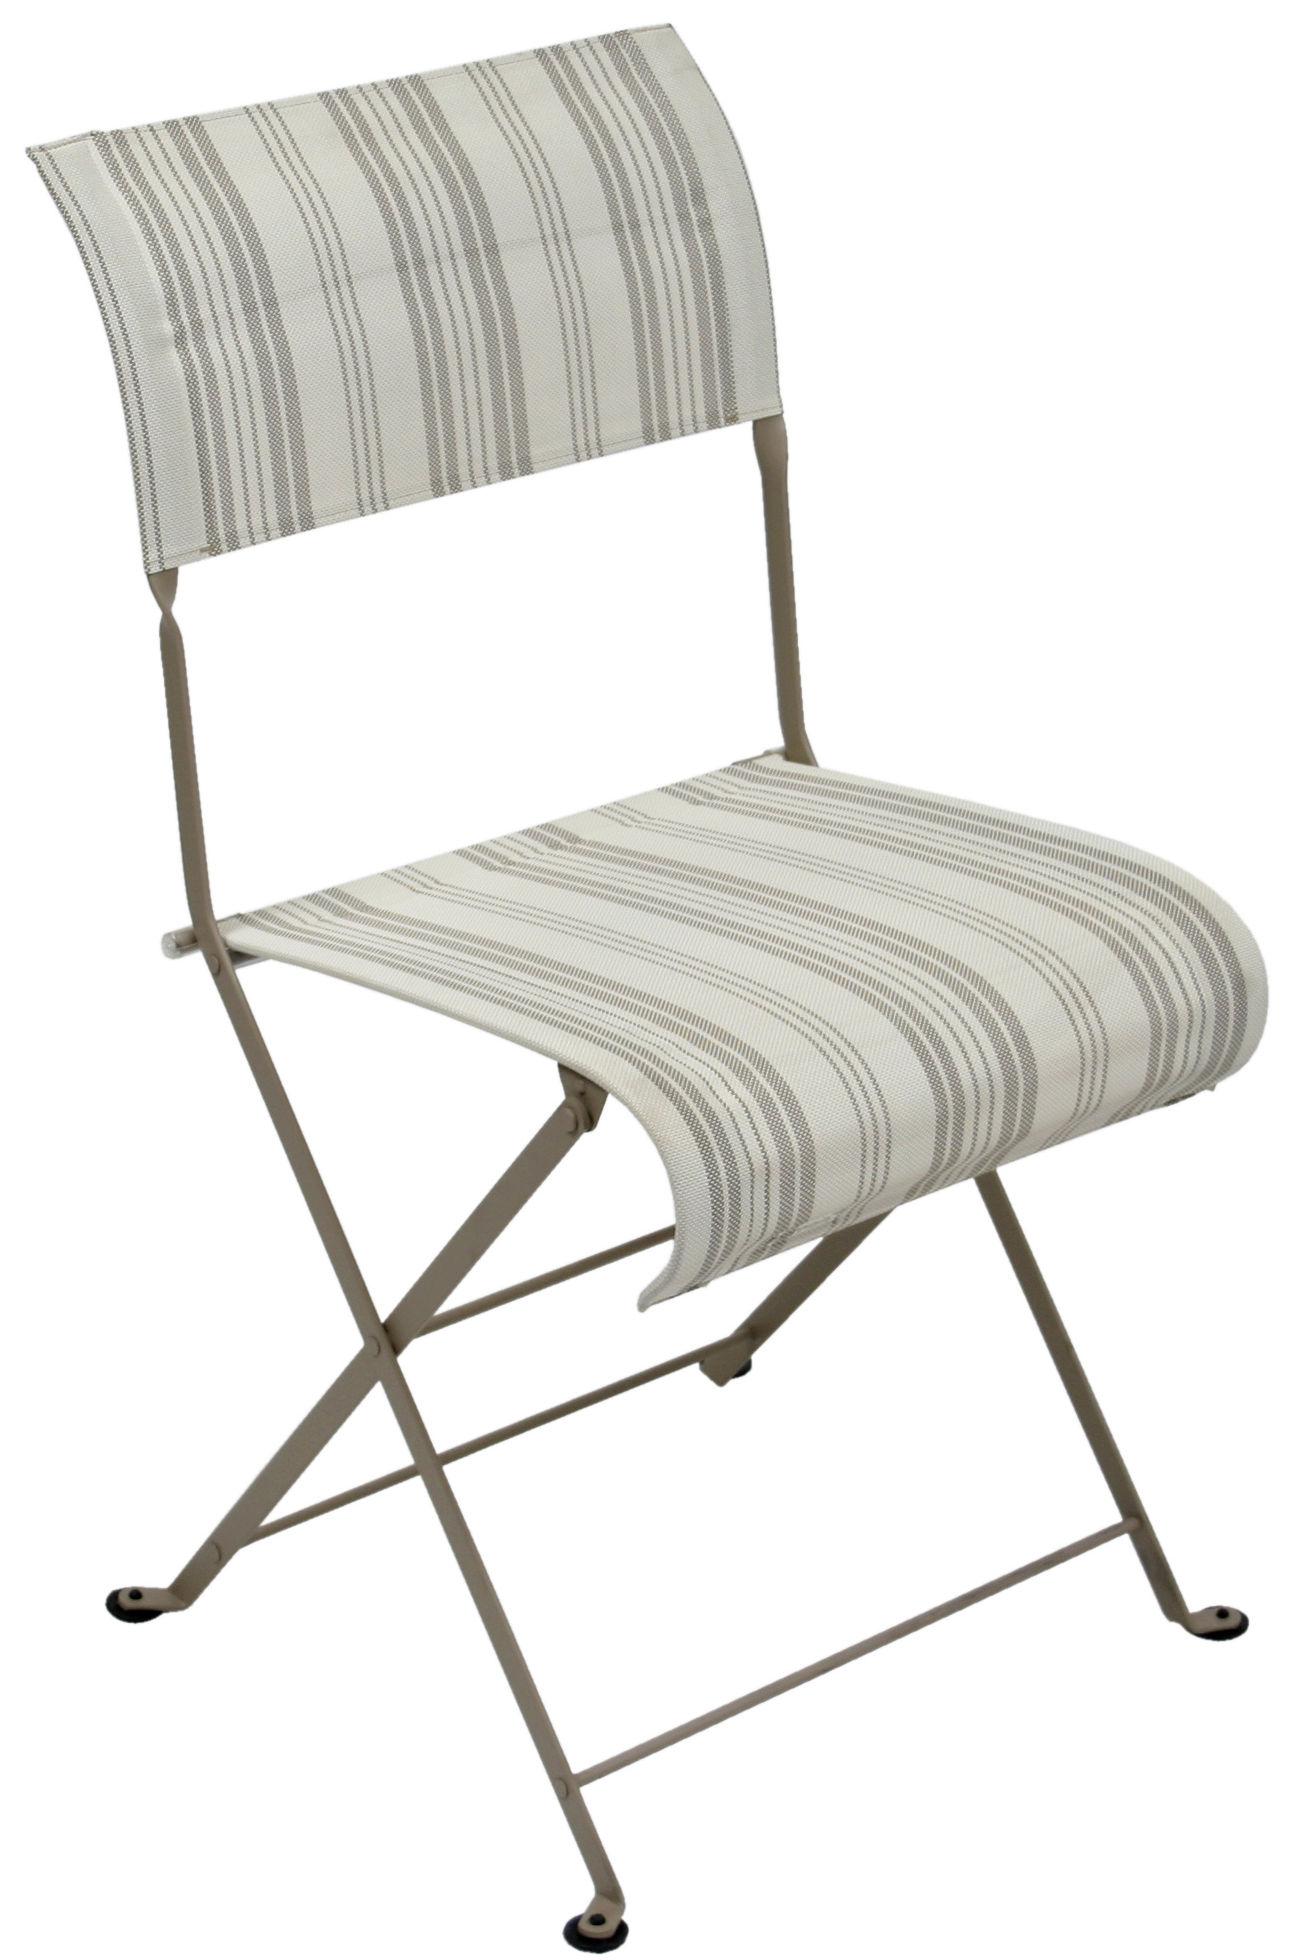 chaise pliante dune toile toile matelas fermob. Black Bedroom Furniture Sets. Home Design Ideas